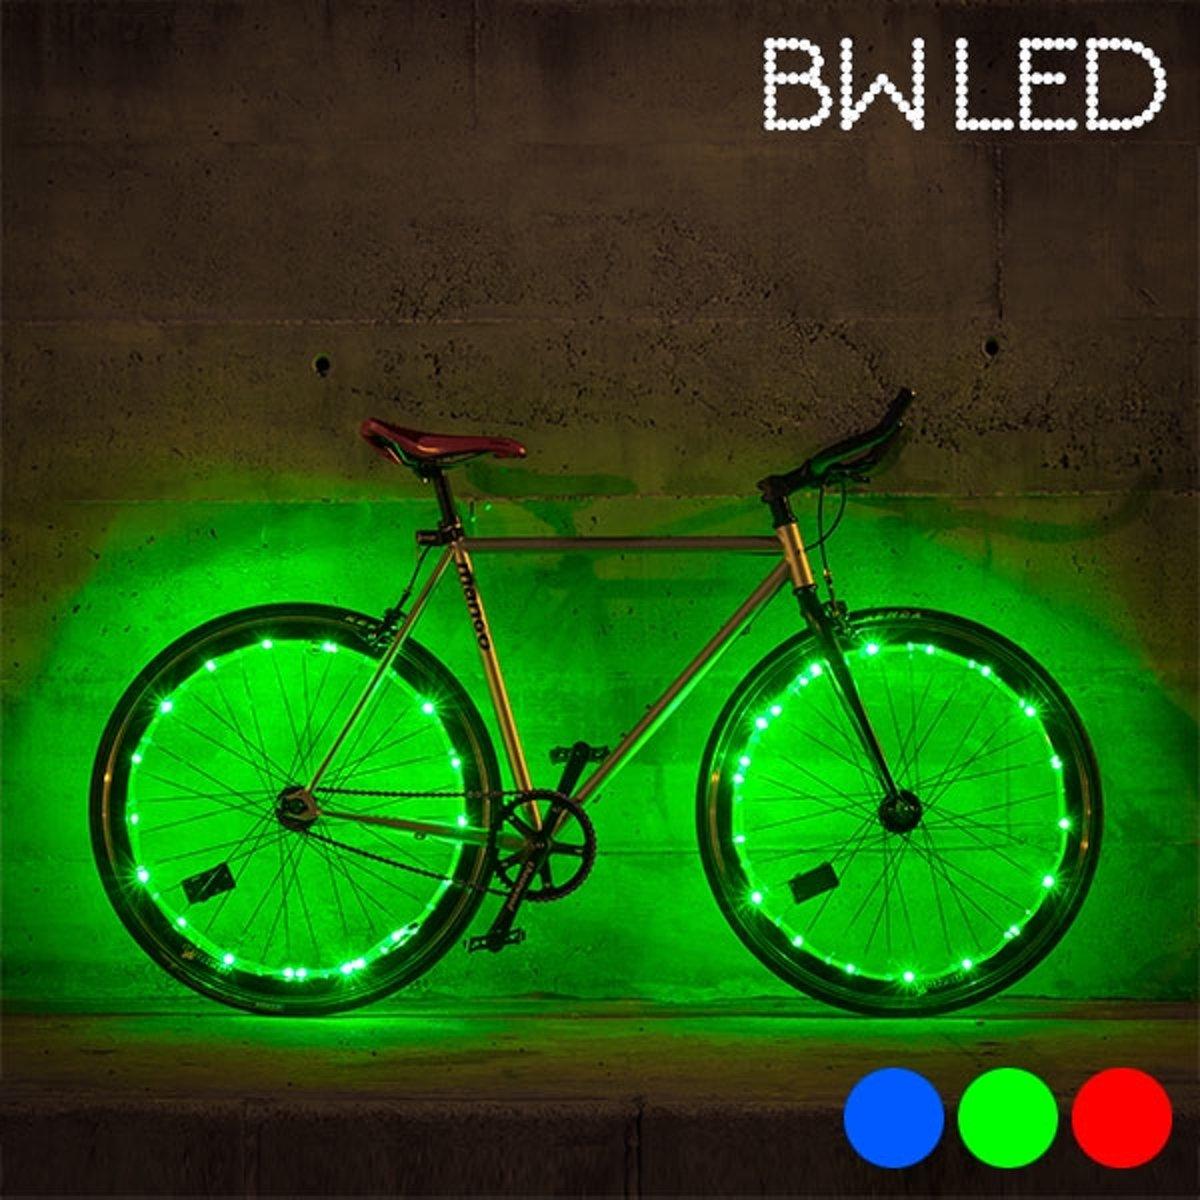 bw led lichtslang voor fiets led verlichting groen